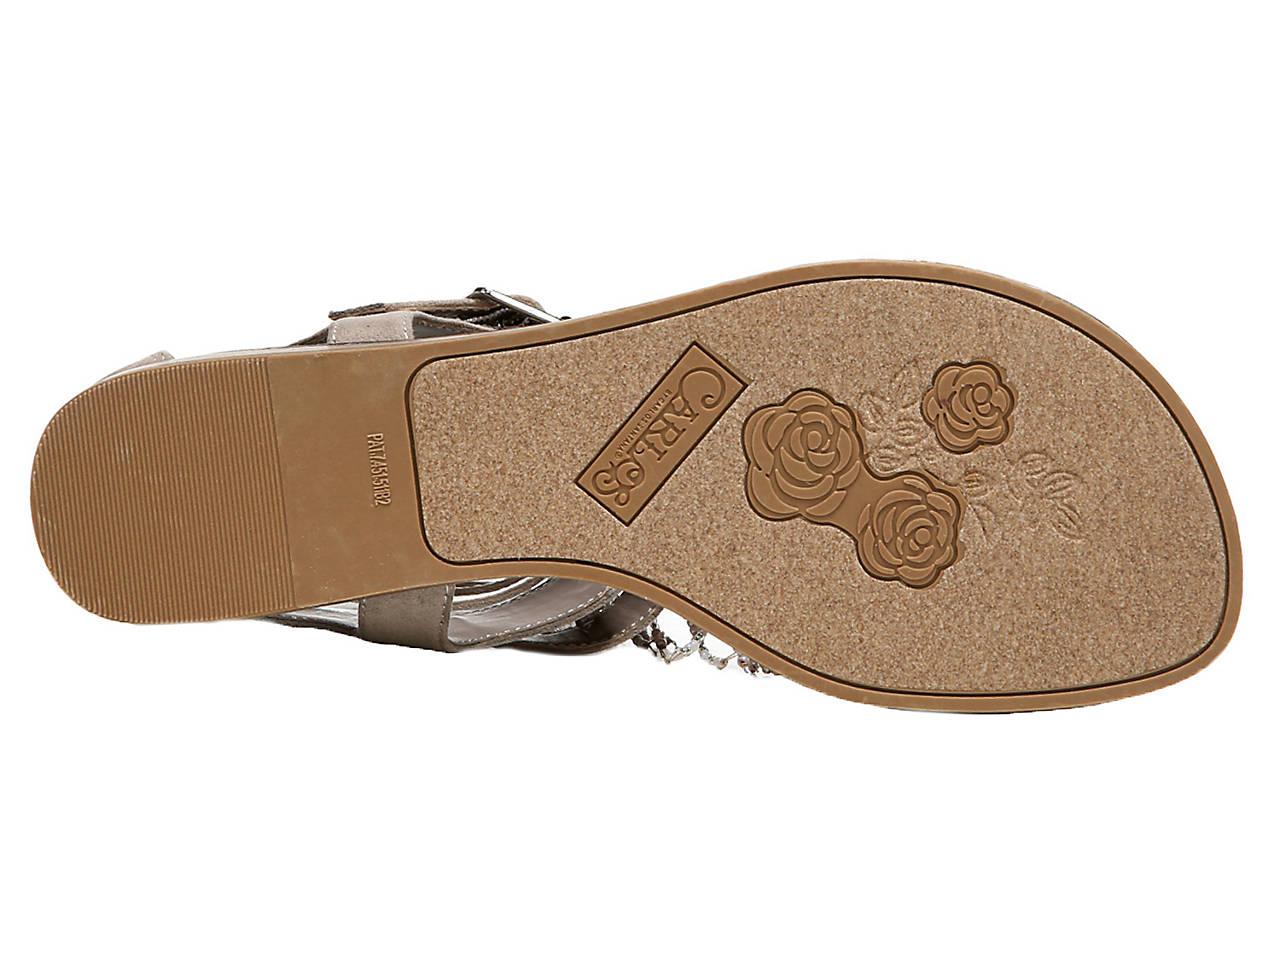 928d4840e868 Carlos by Carlos Santana Taos Gladiator Sandal Women s Shoes